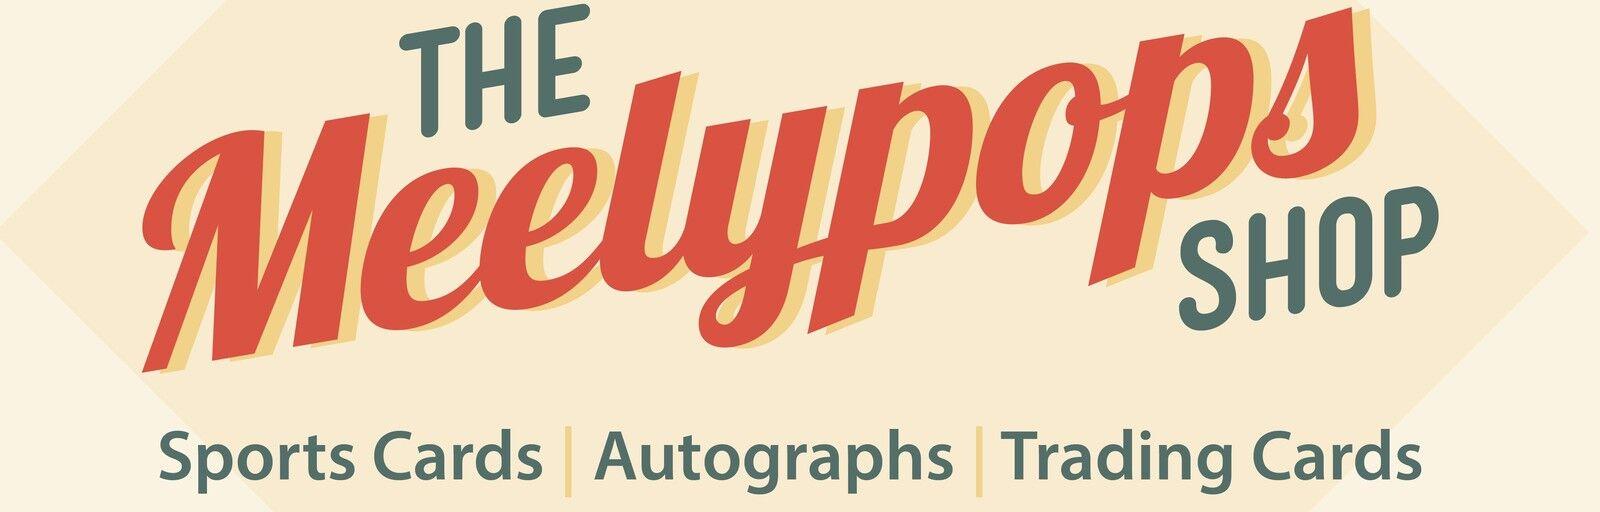 The Meelypops Shop